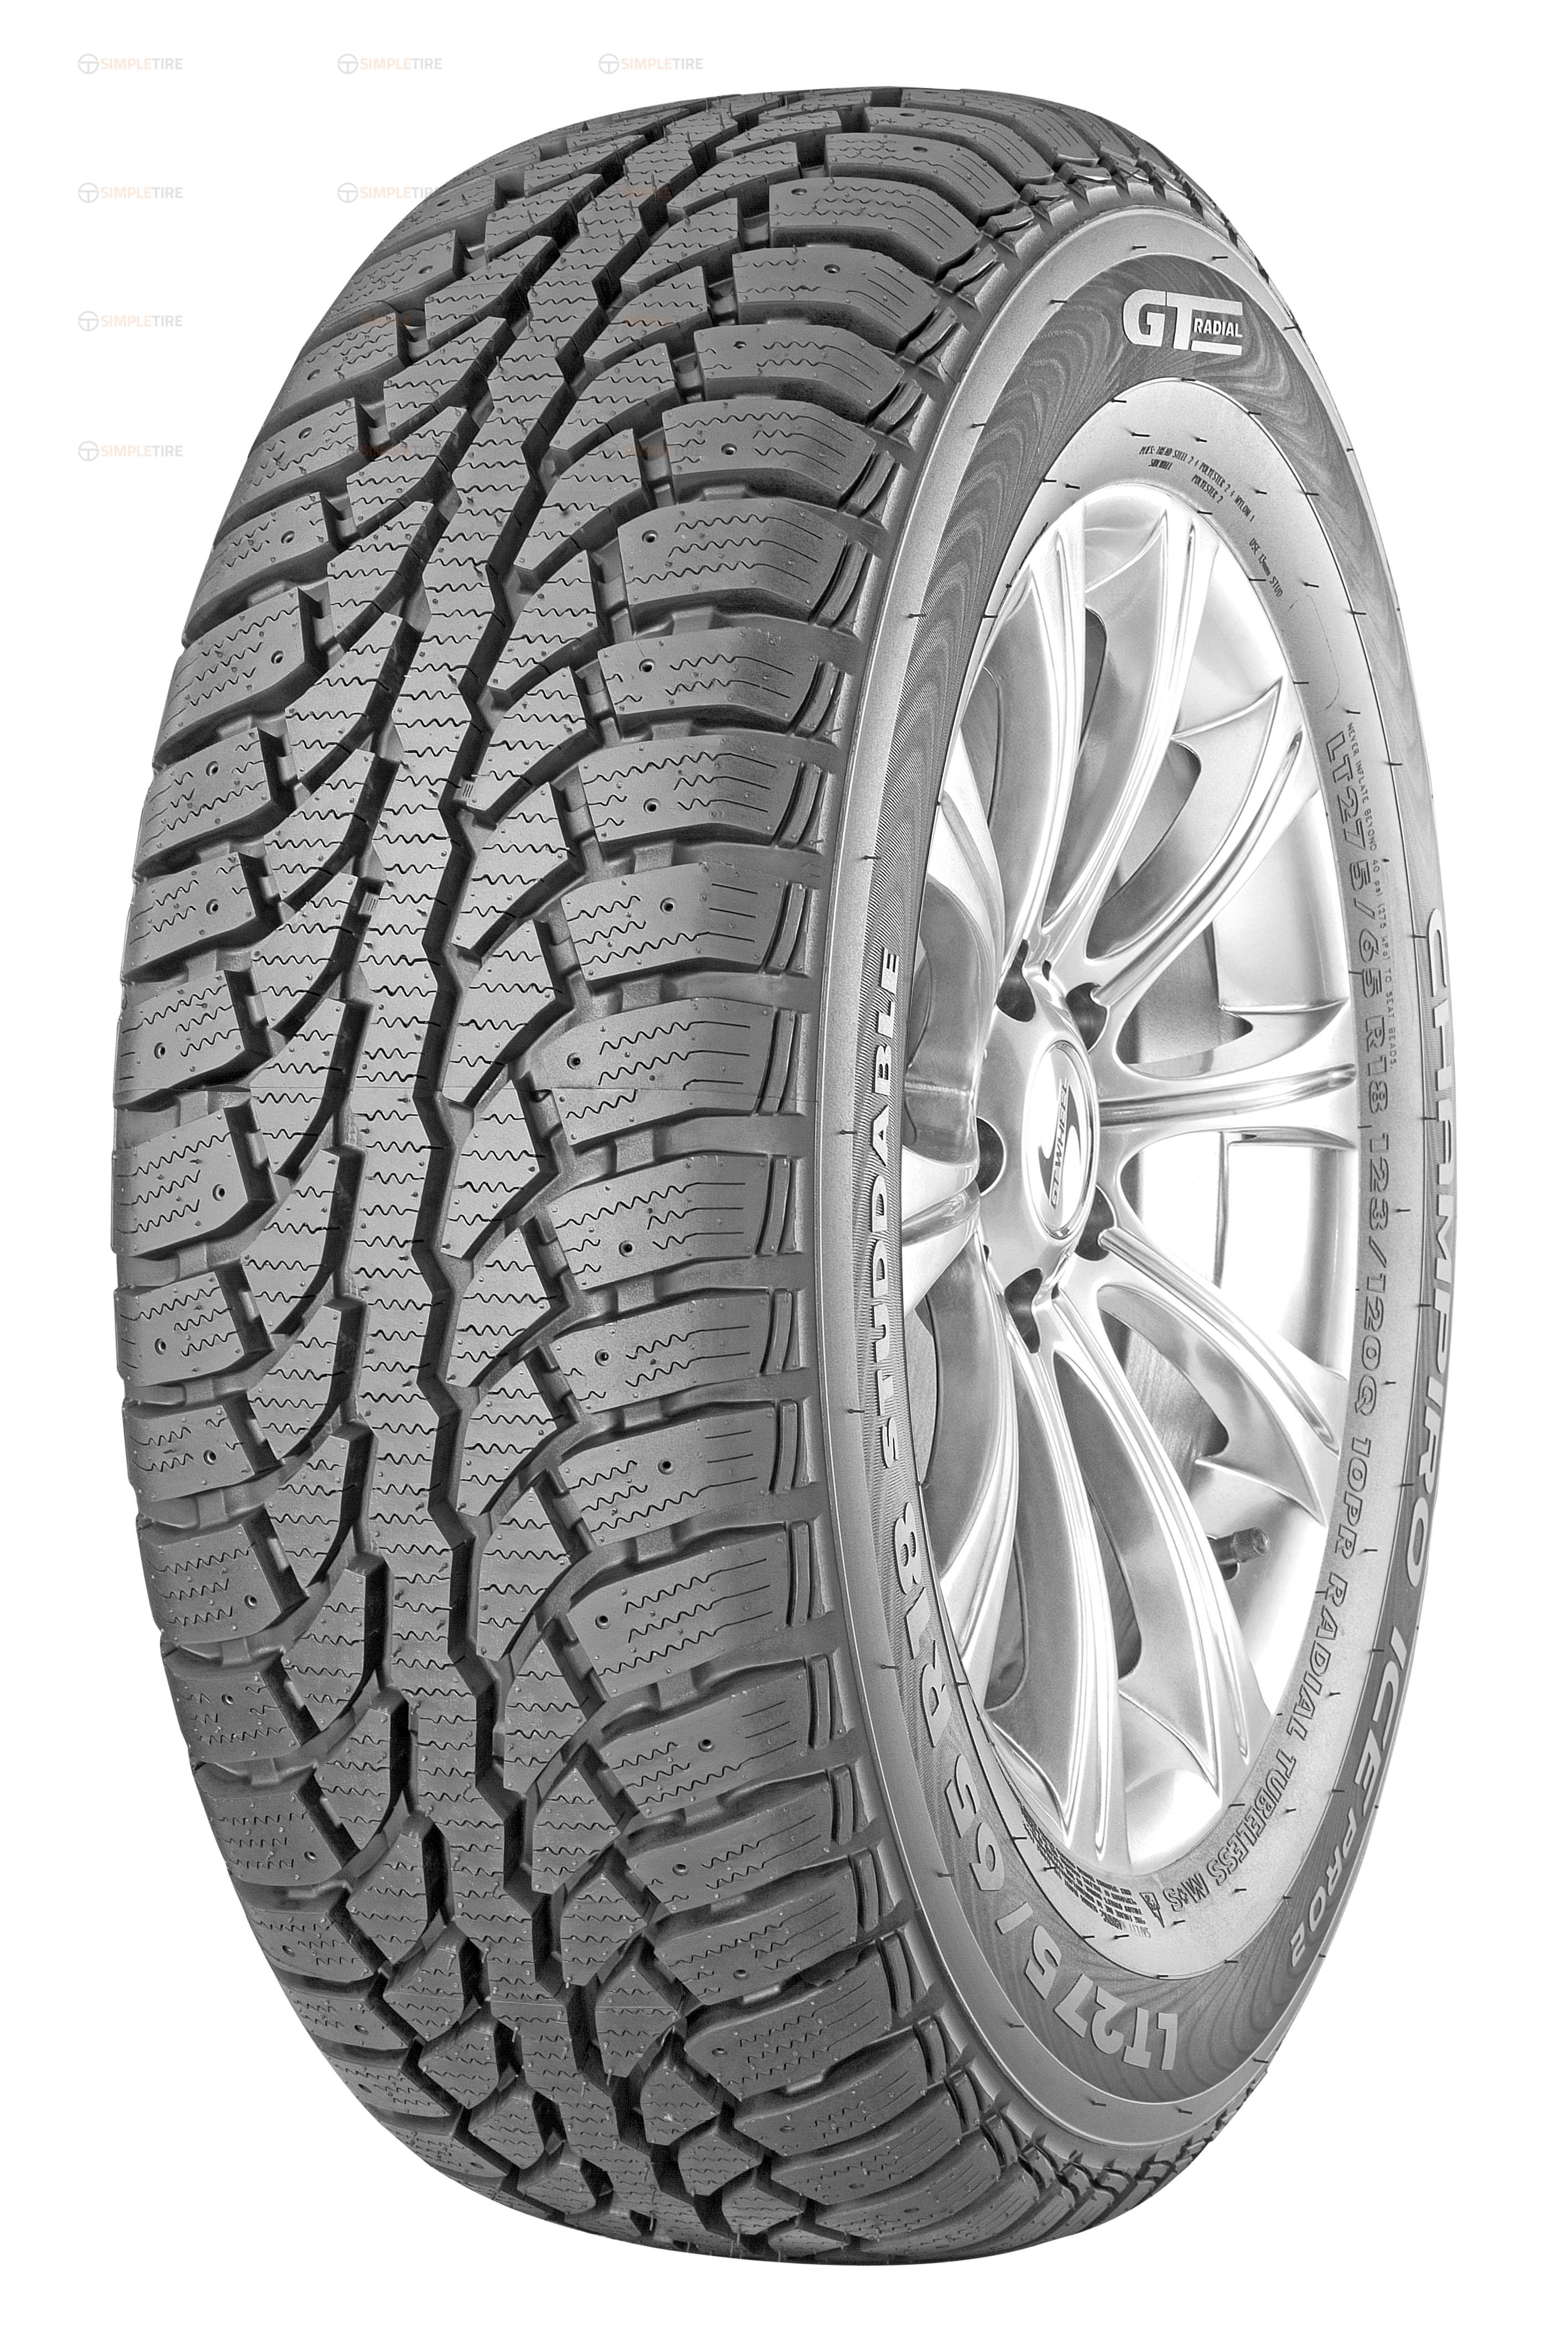 100A1014 LT265/70R17 Champiro Icepro 2 GT Radial